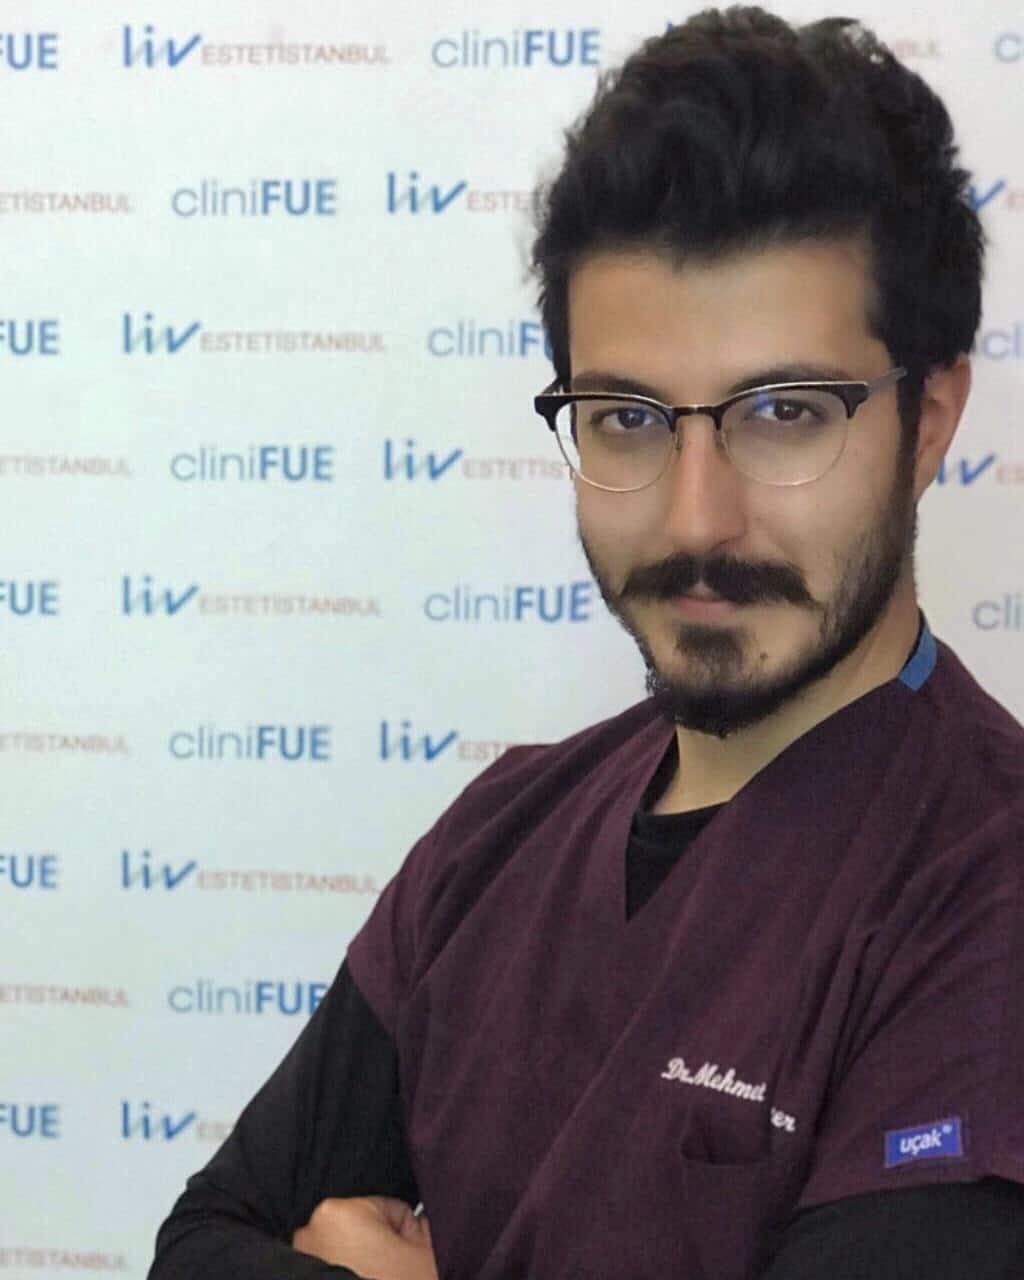 Doctor Mehmet Dogrur cliniFUE